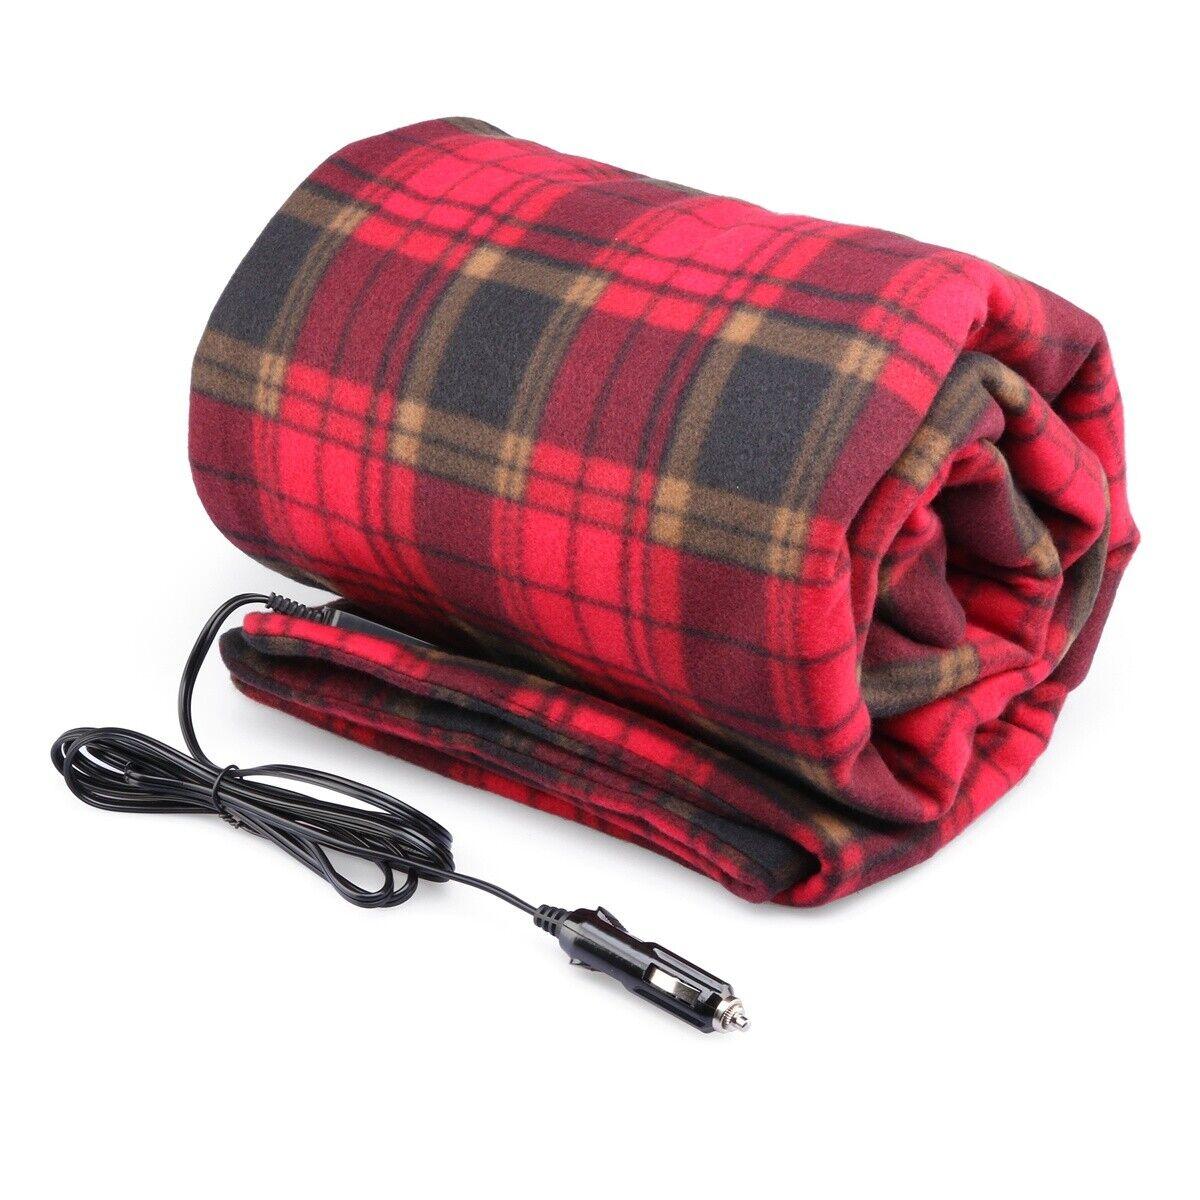 [Premium Quality] Winter Warm Car Heated Electric Blanket Heating Seat Cushion